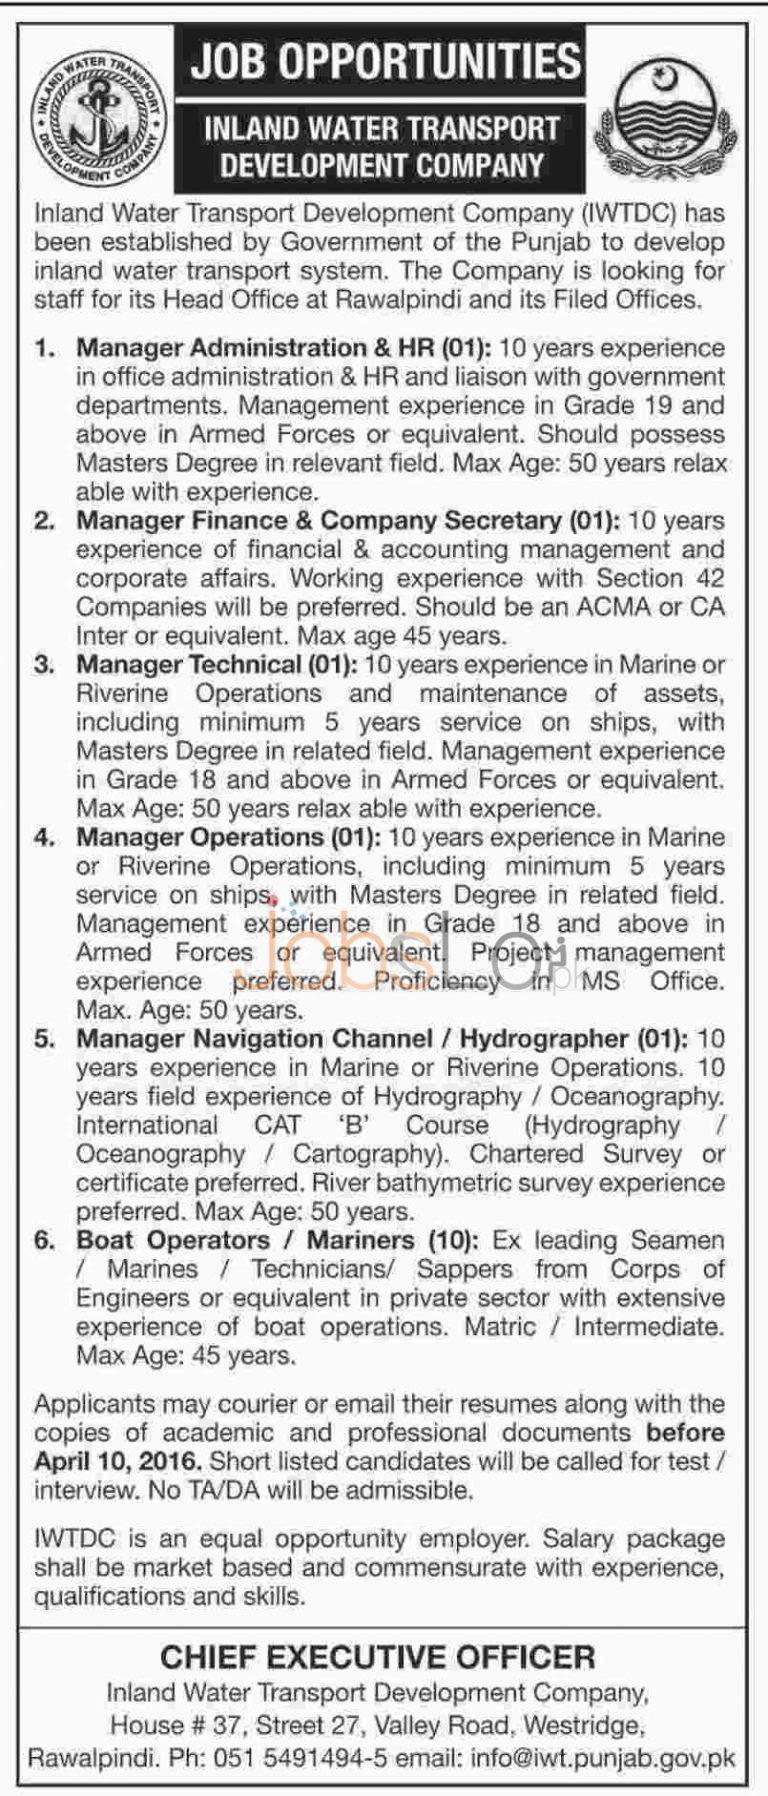 Inland Water Transport Development Company Rawalpindi Jobs 2016 Apply Online